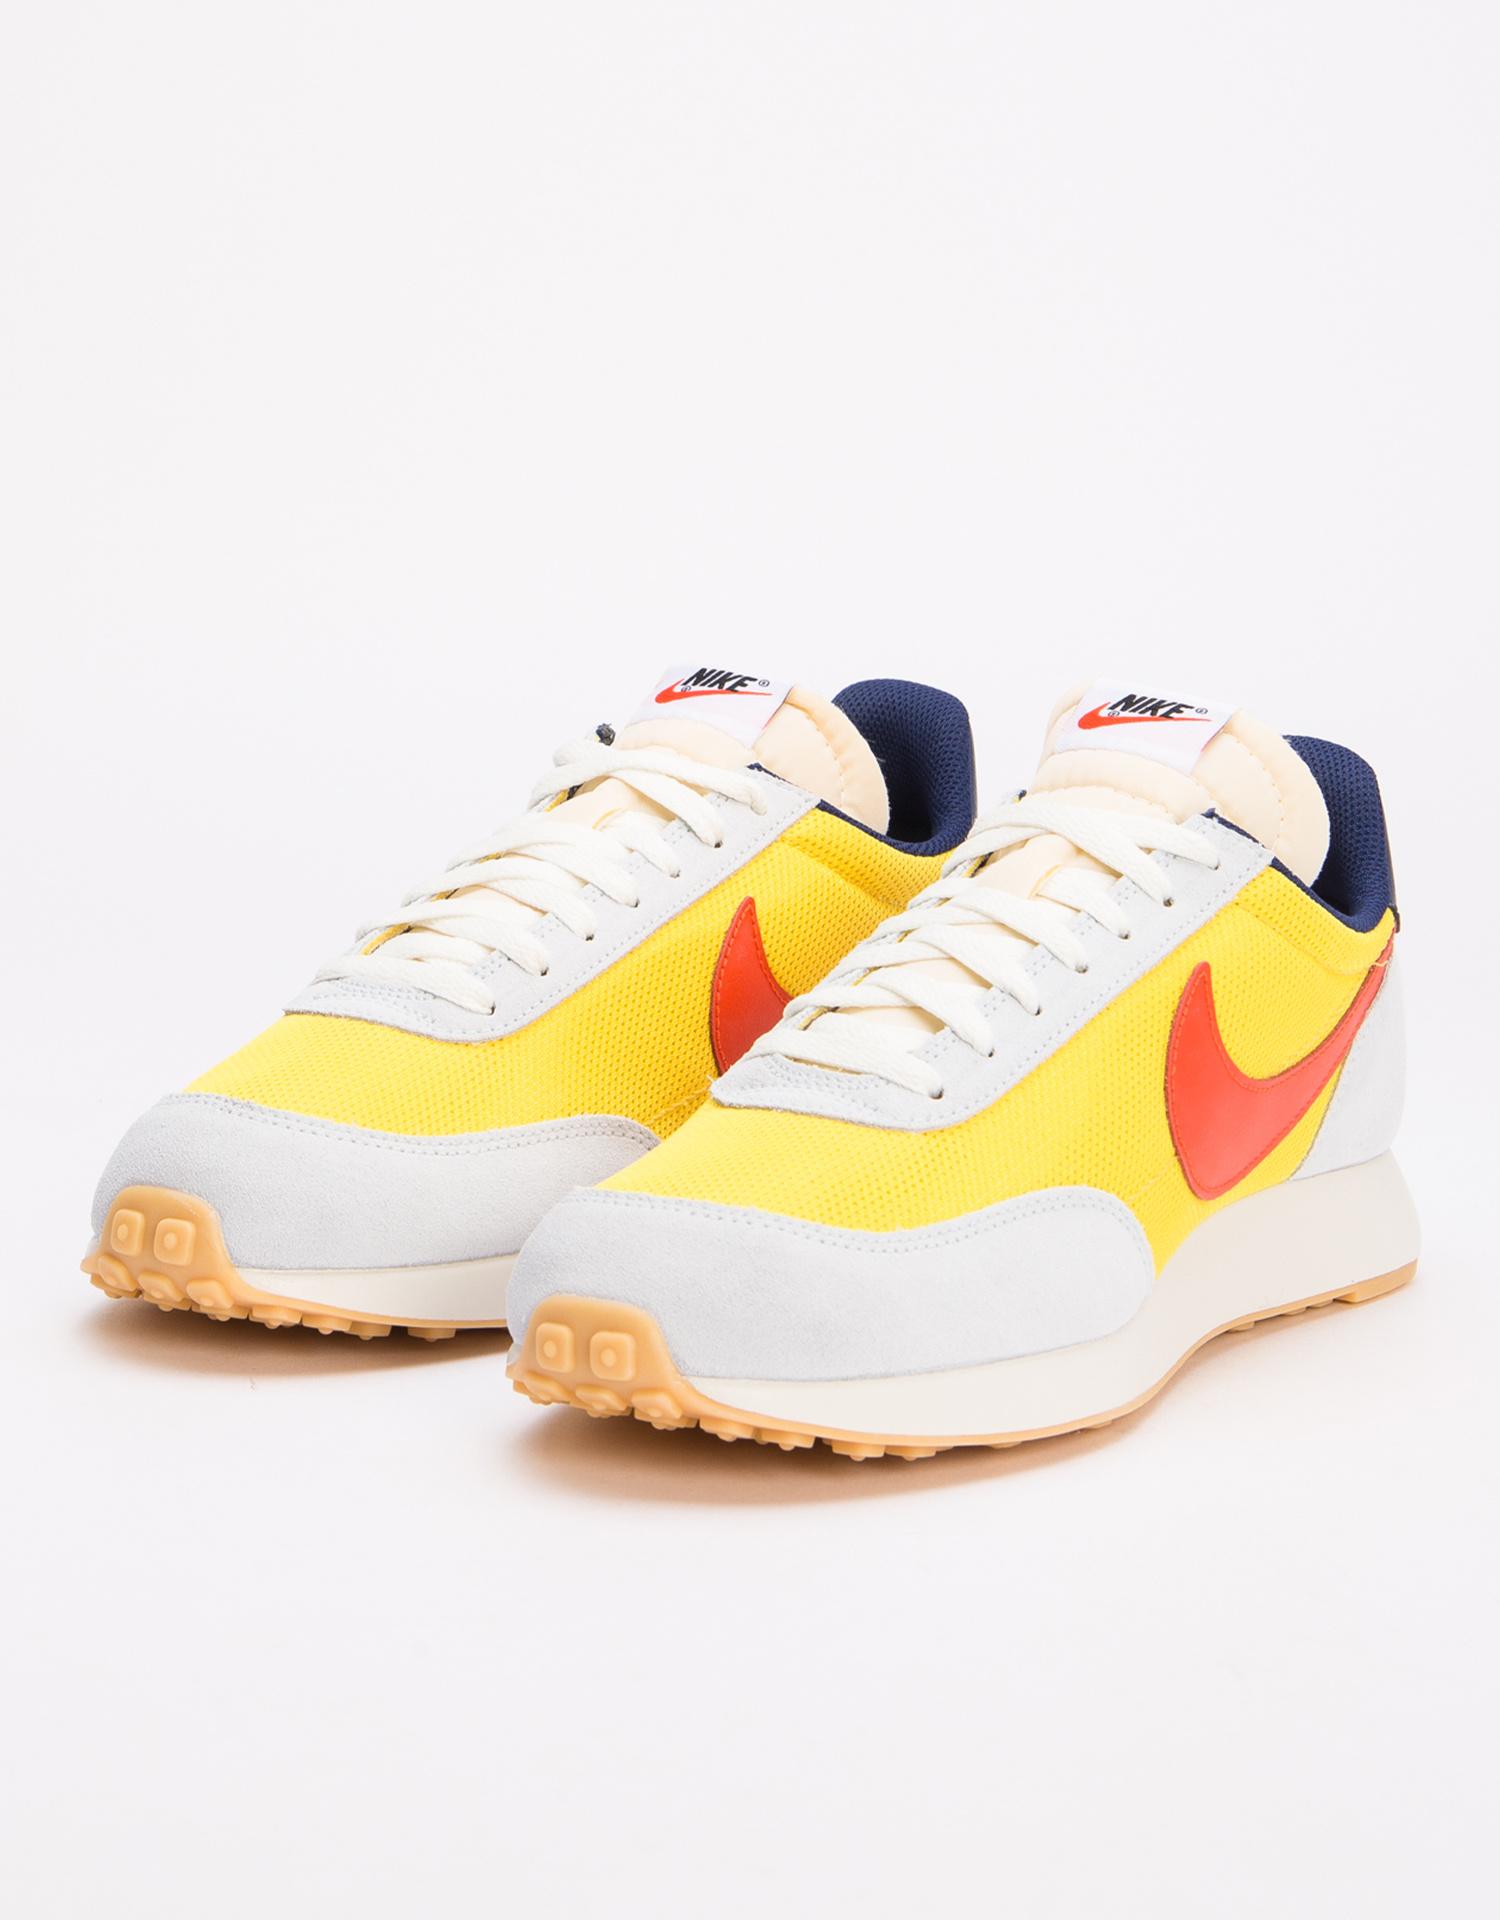 new styles b9bc8 5cf37 Nike Air Tailwind 79 Blue Tint Team Orange-Tour Yellow ...